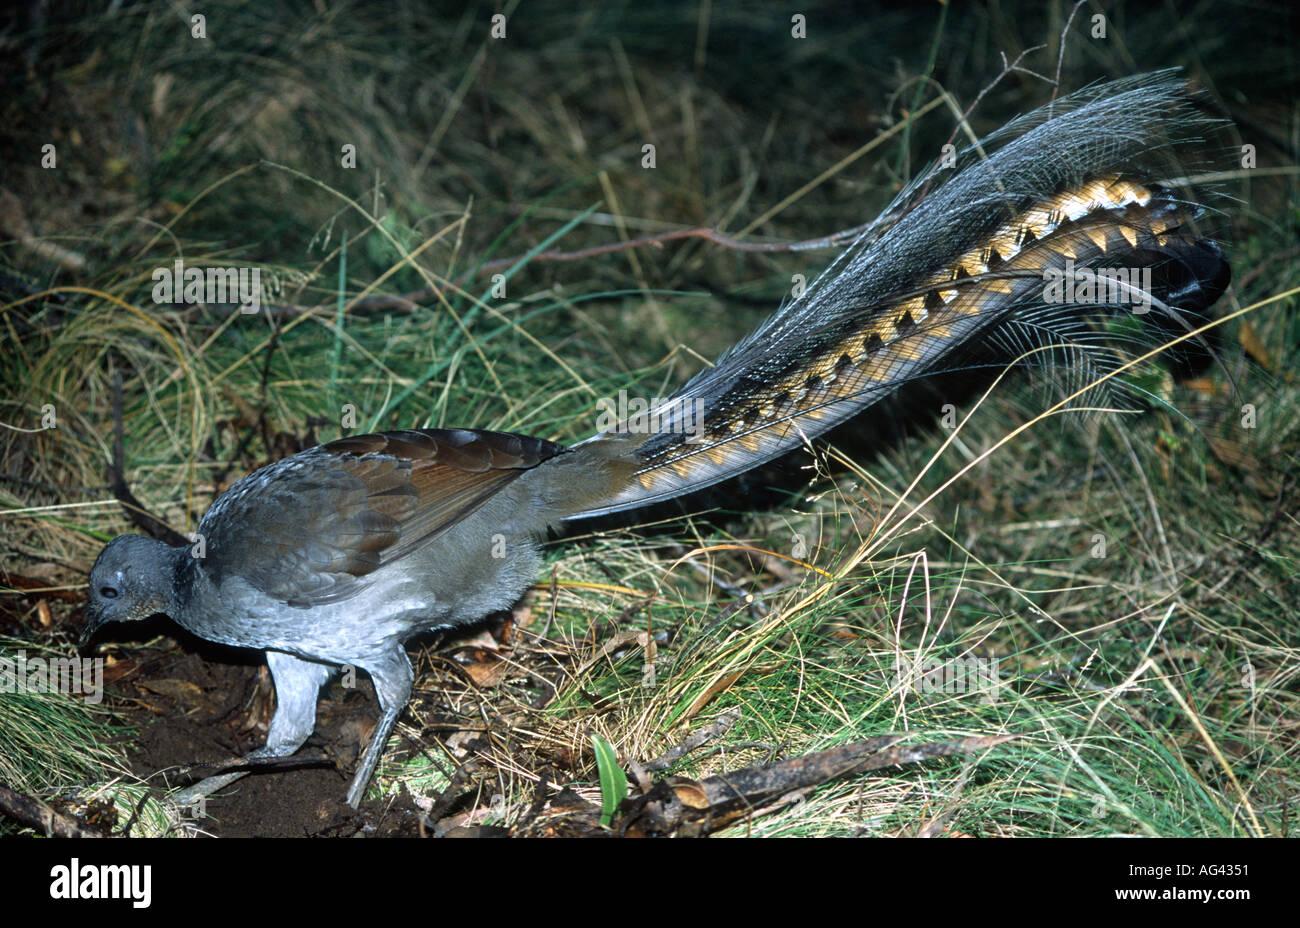 male-superb-lyrebird-menura-novaehollandiae-is-a-large-australian-AG4351.jpg